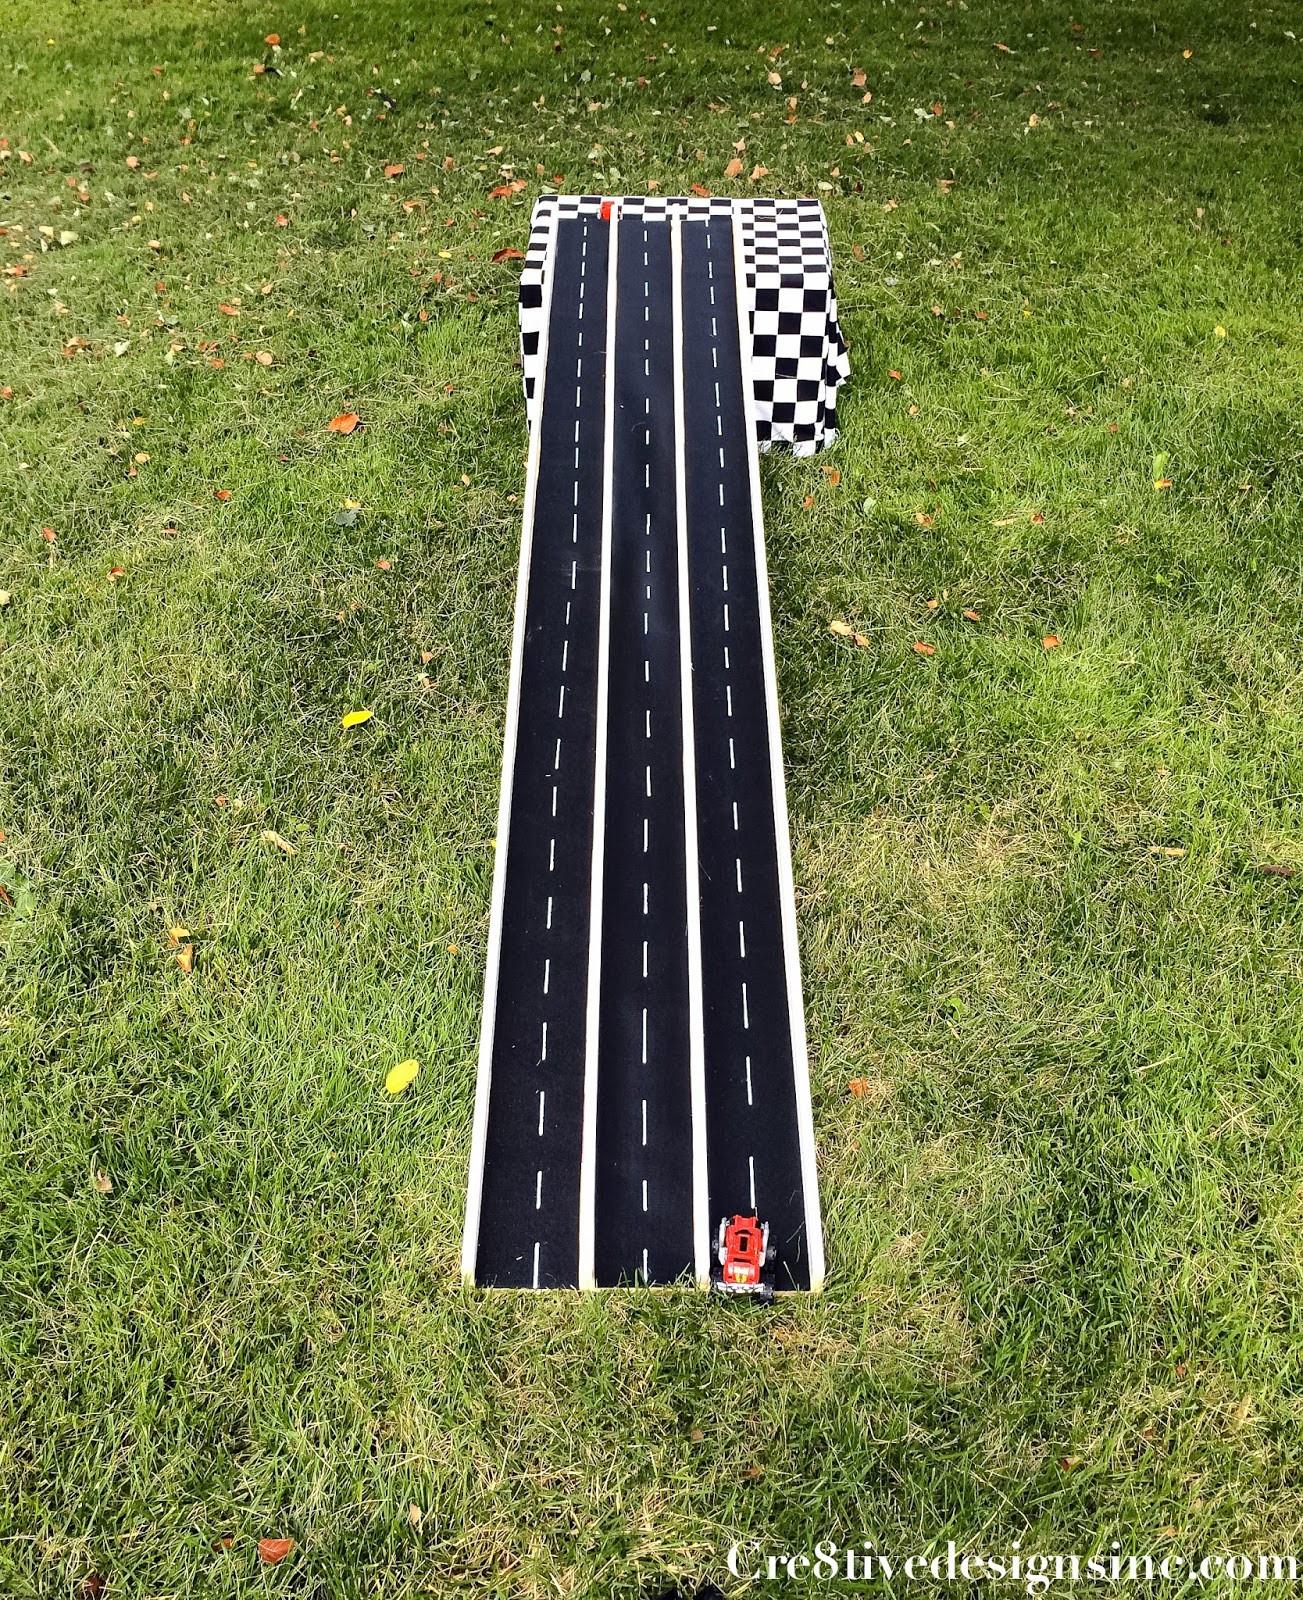 DIY Race Track  Backyard Projects for Kids DIY Race Car Track DO IT